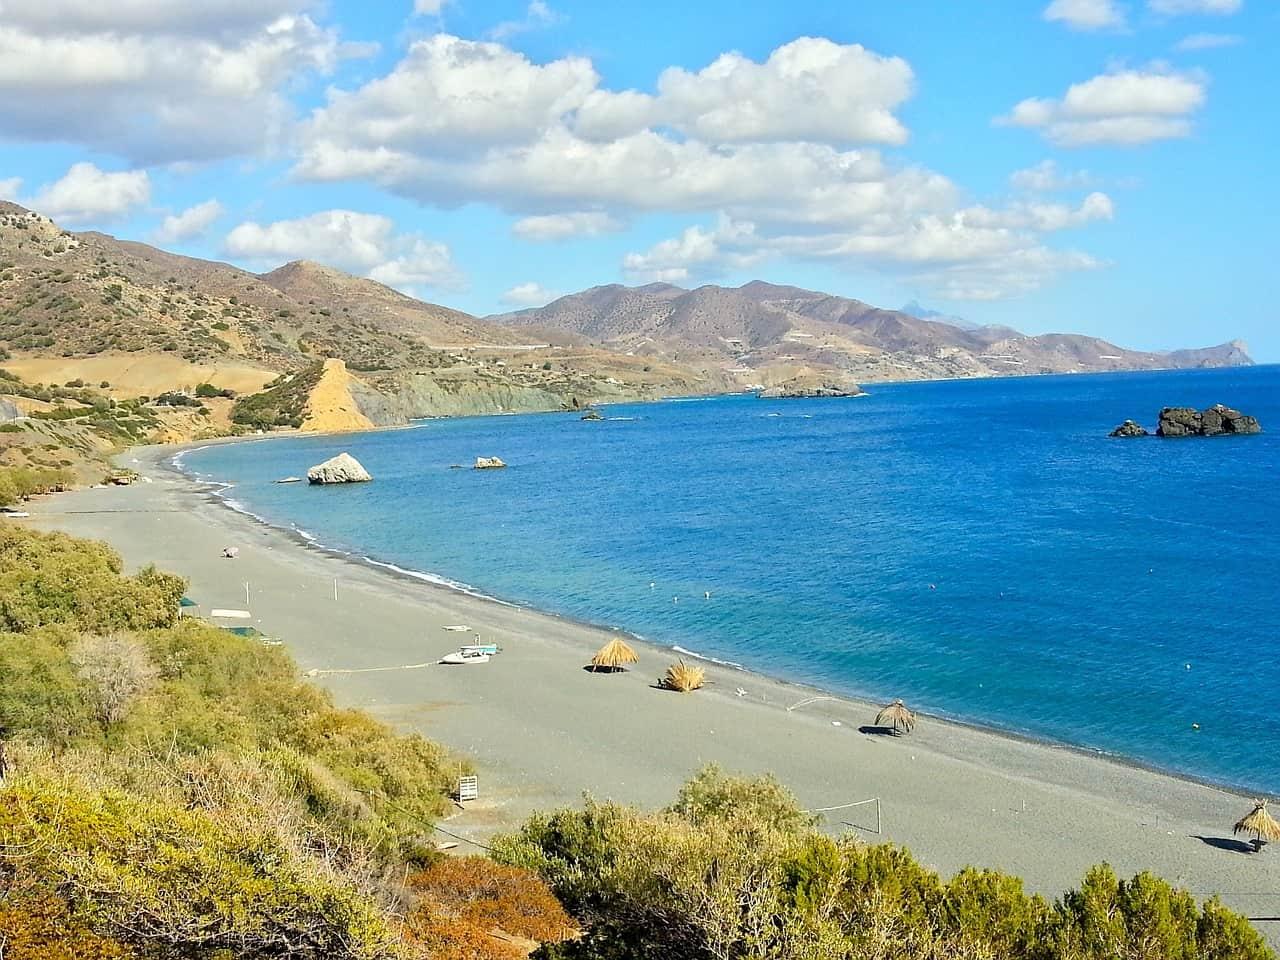 Selena Gebirge Malia Kreta Urlaub - Familien